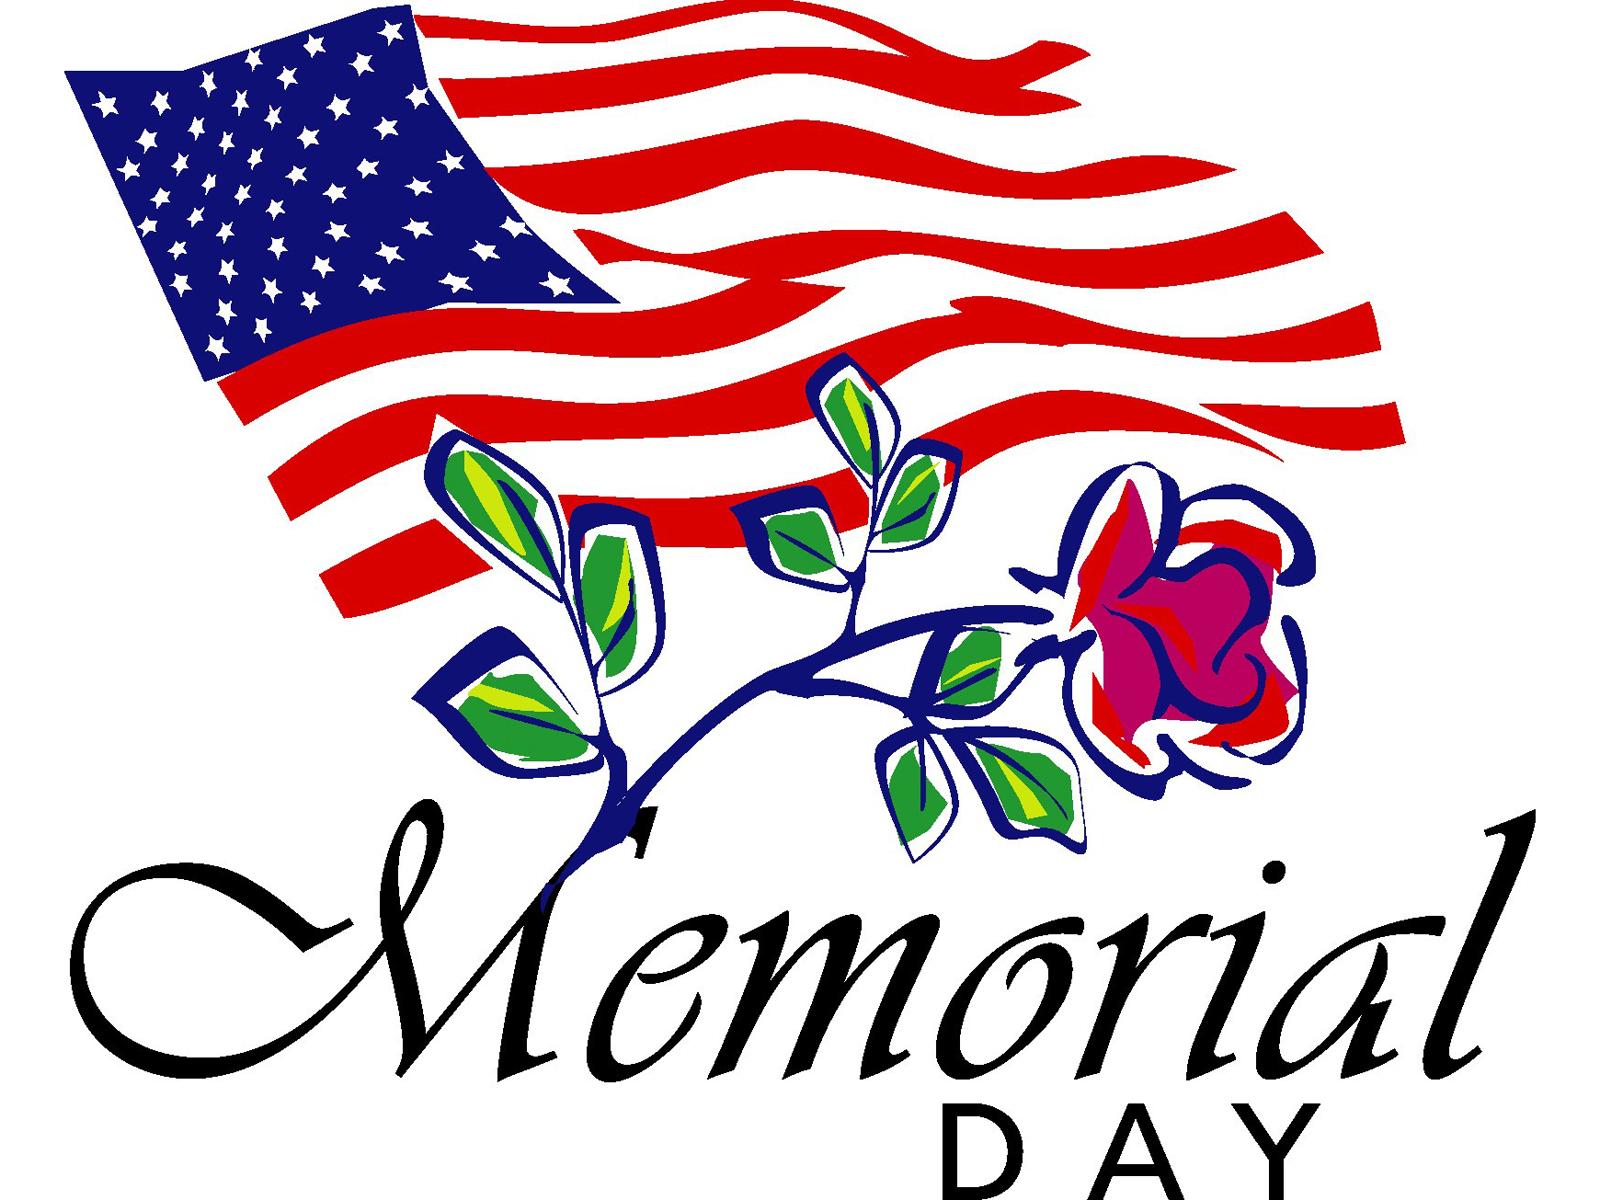 Free download Memorial Day wallpaper 1600x1200 004